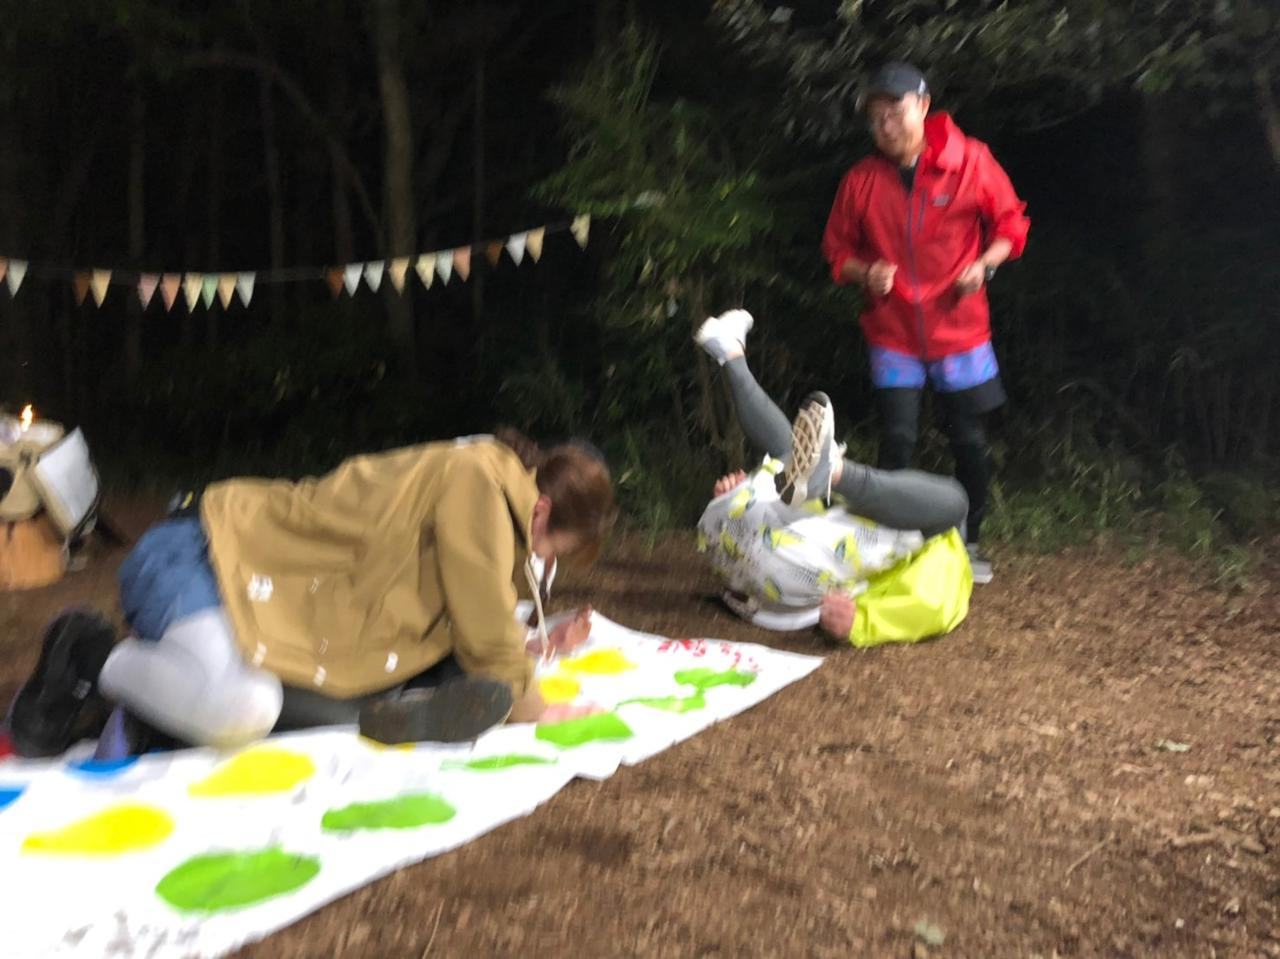 Images : 10番目の画像 - おぎやはぎのハピキャン「映えキャンプ」写真集 - ハピキャン|キャンプ・アウトドア情報メディア